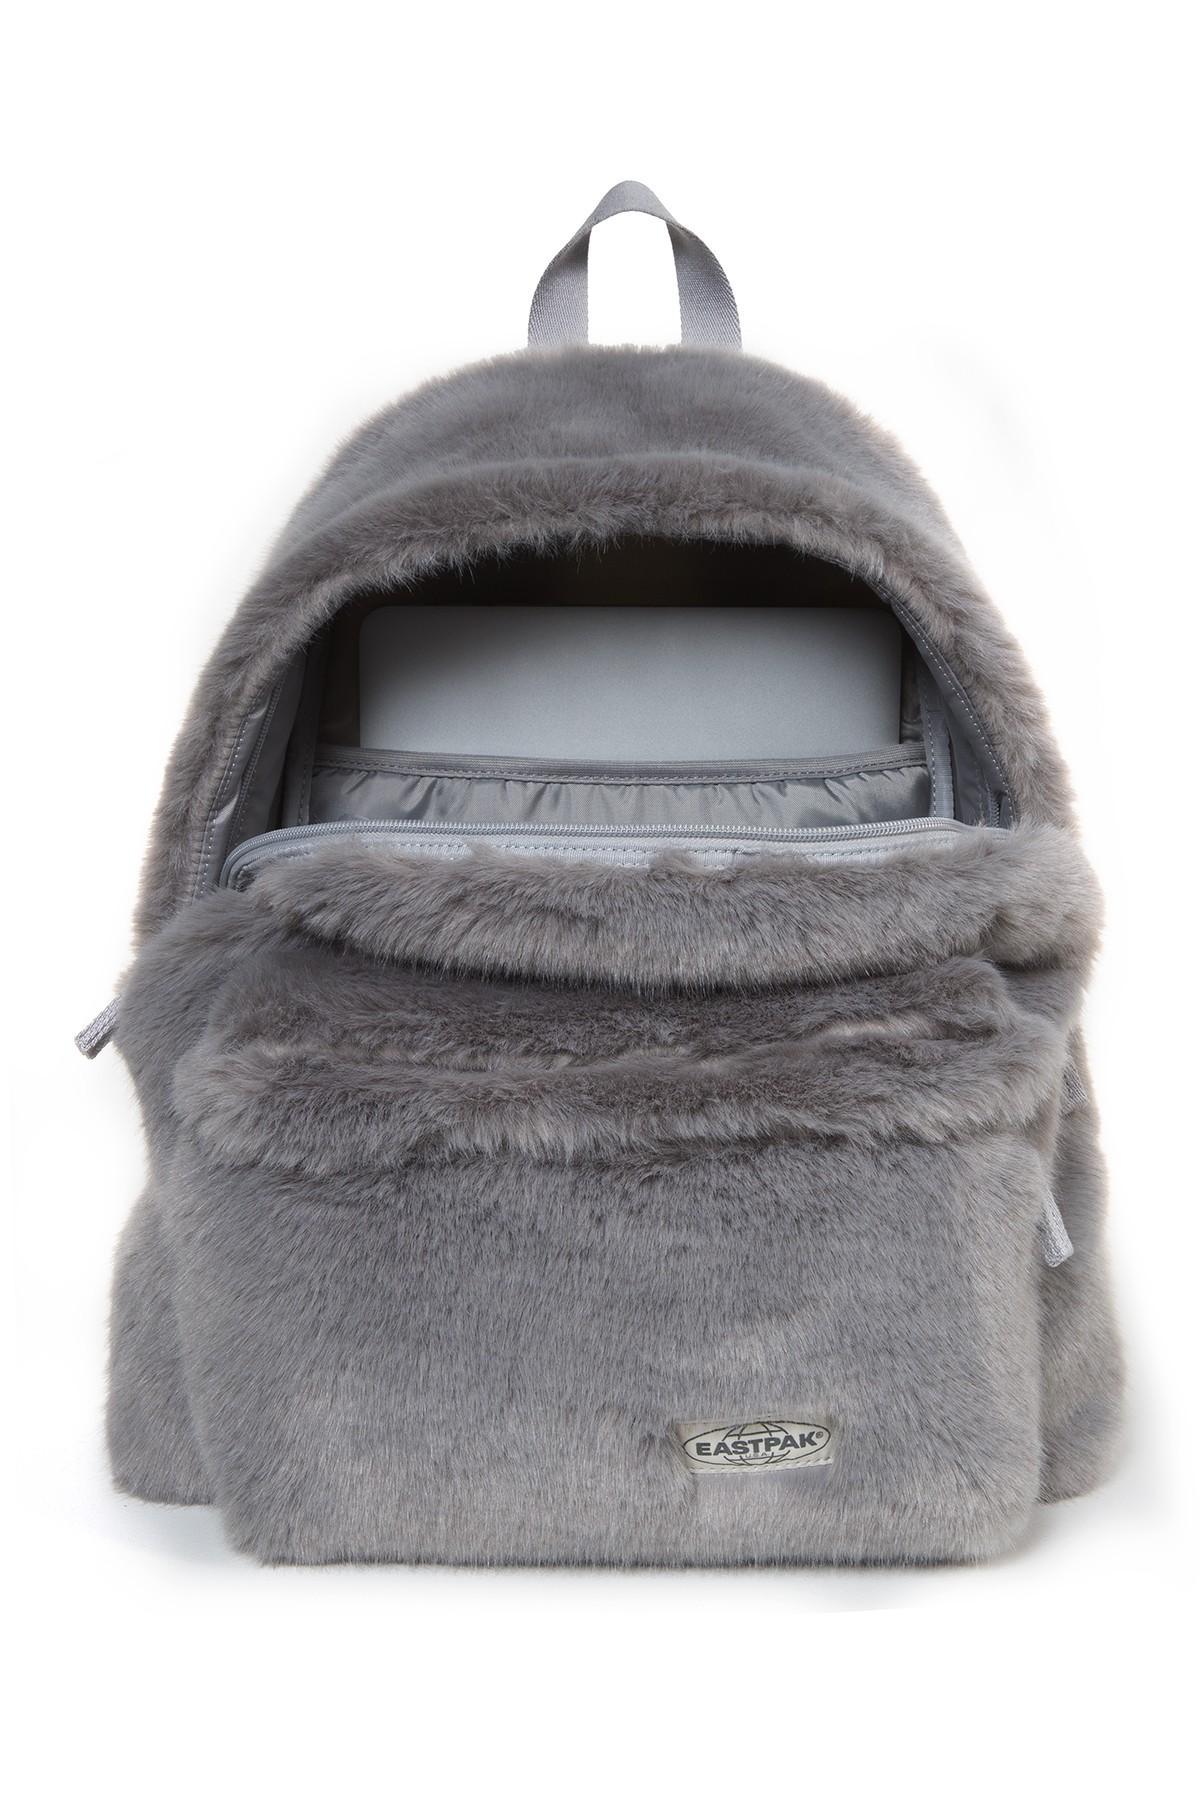 f134524cff8 Eastpak - Gray Faux Fur Padded Pak'r Backpack - Lyst. View fullscreen